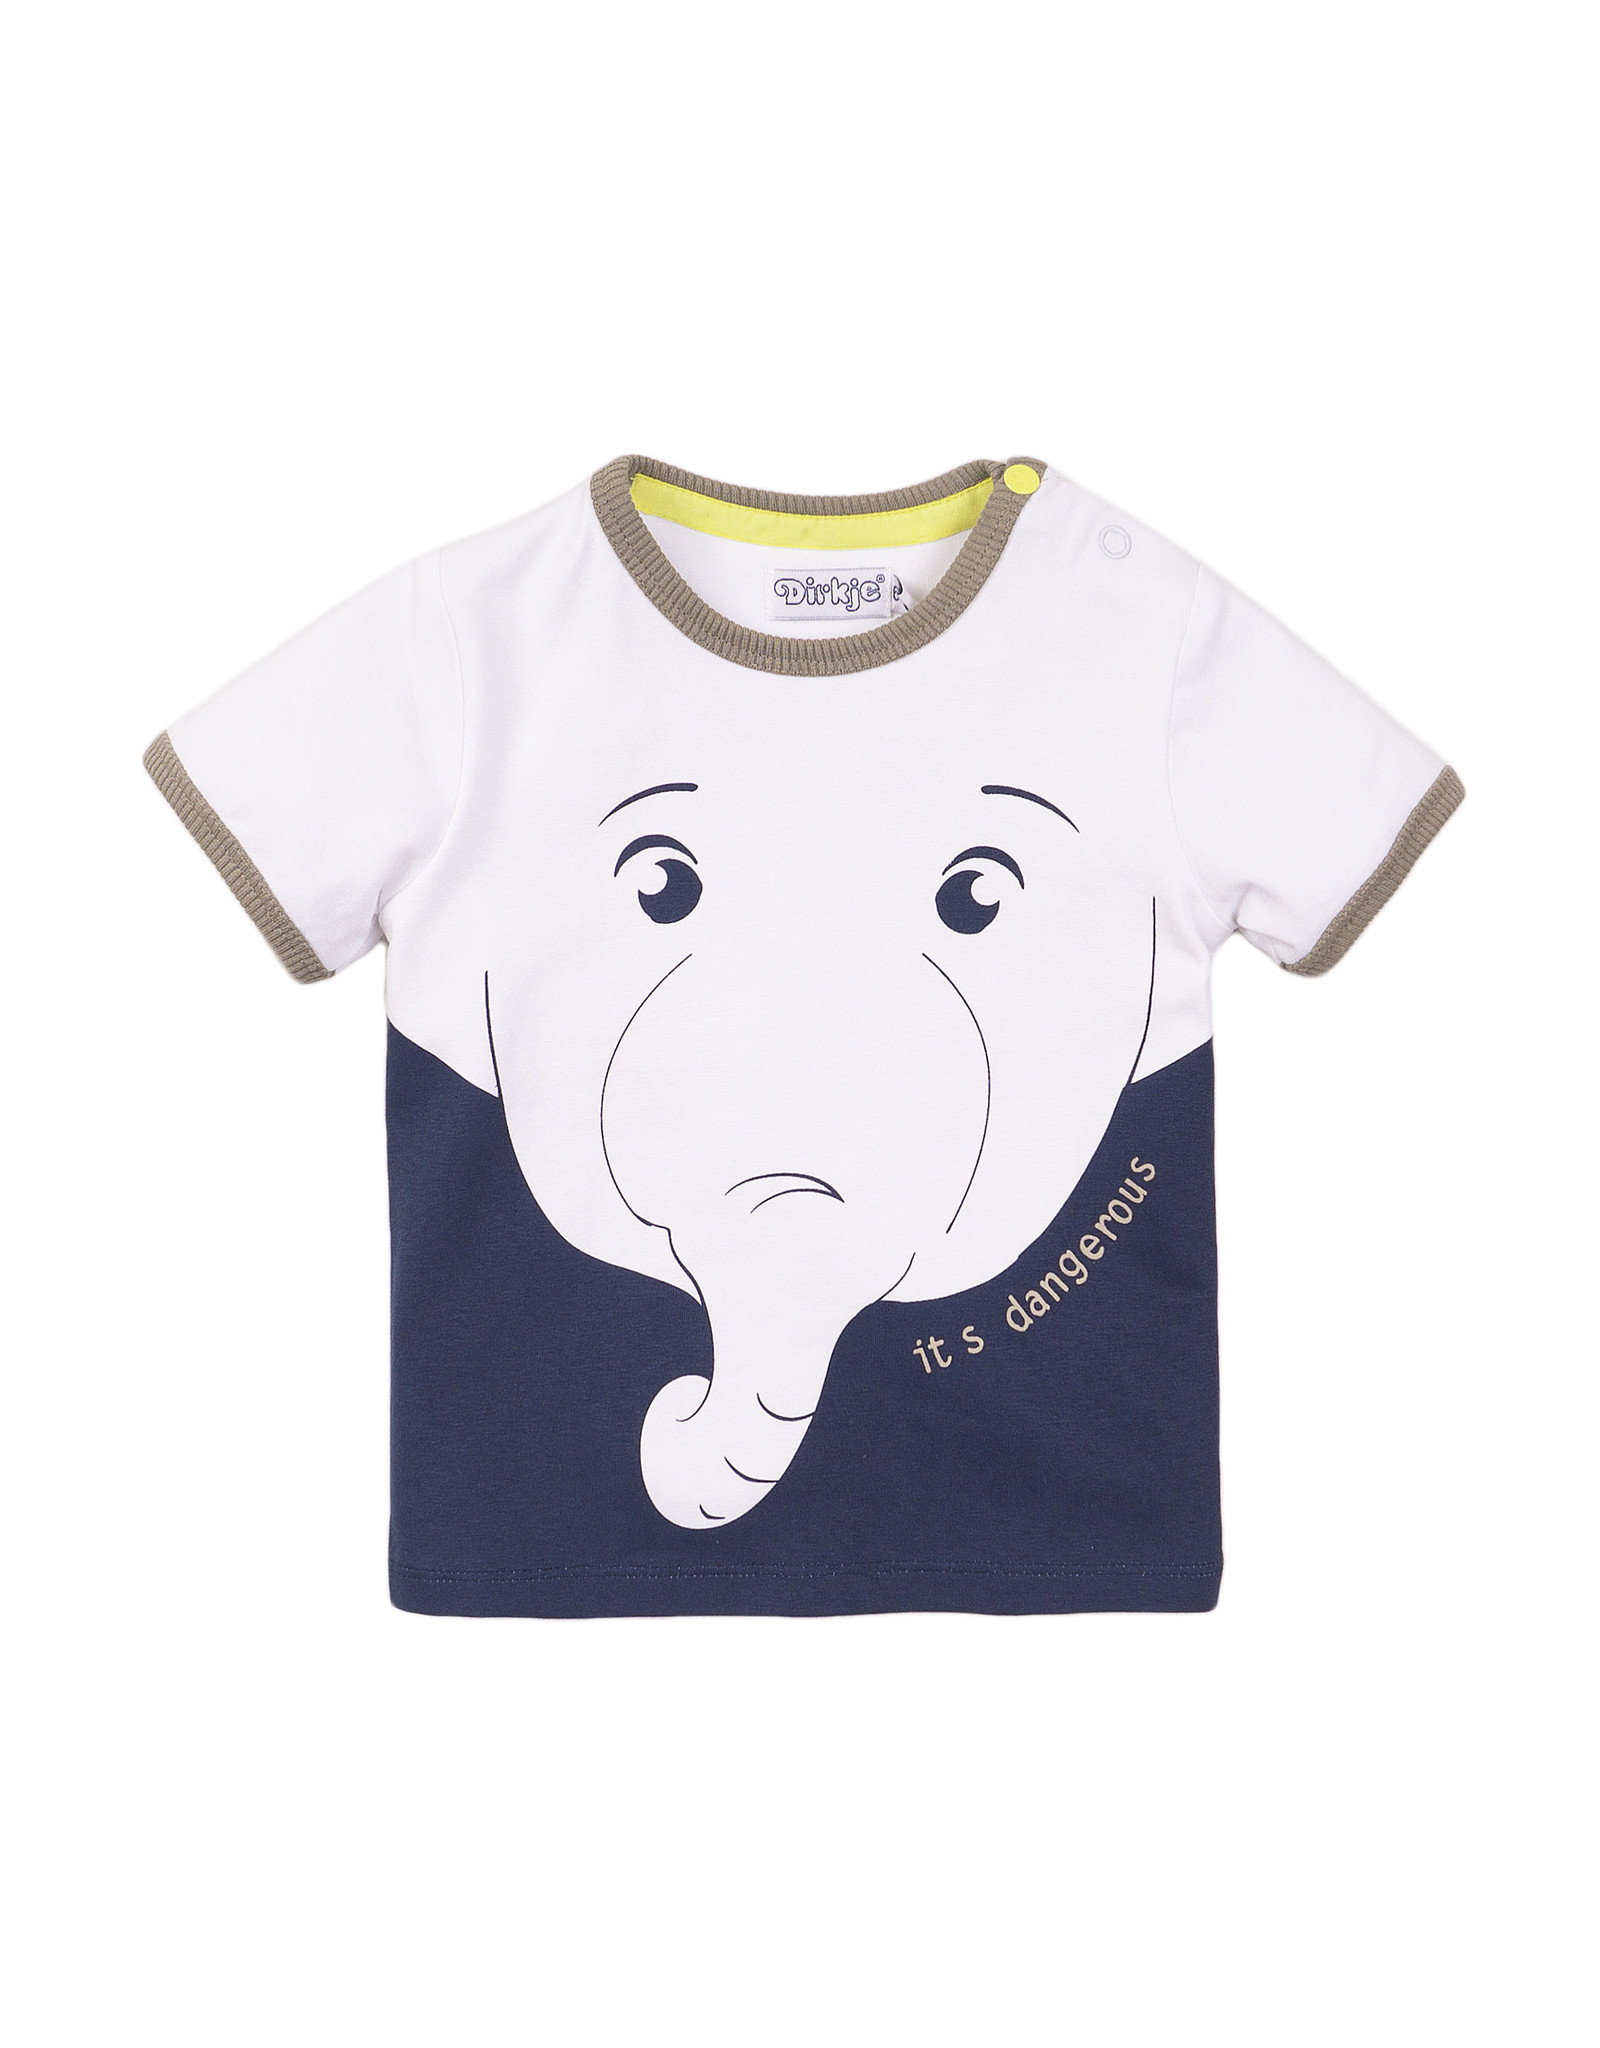 Dirkje Dirkje baby jongens t-shirt Elefant White Navy